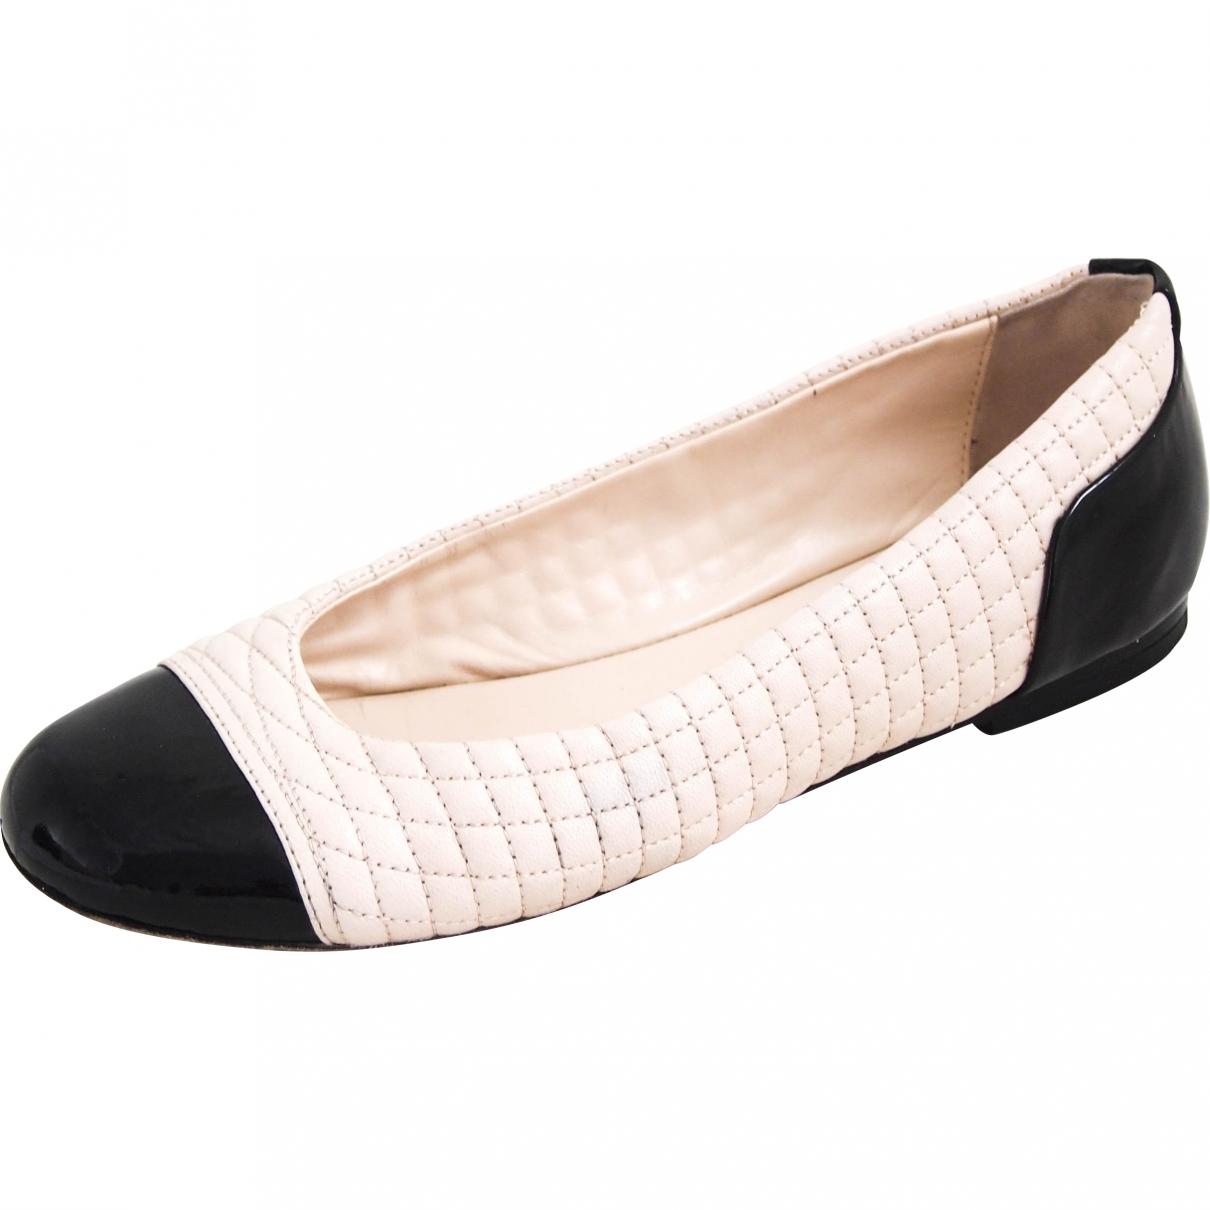 Bally \N Black Leather Ballet flats for Women 36.5 EU